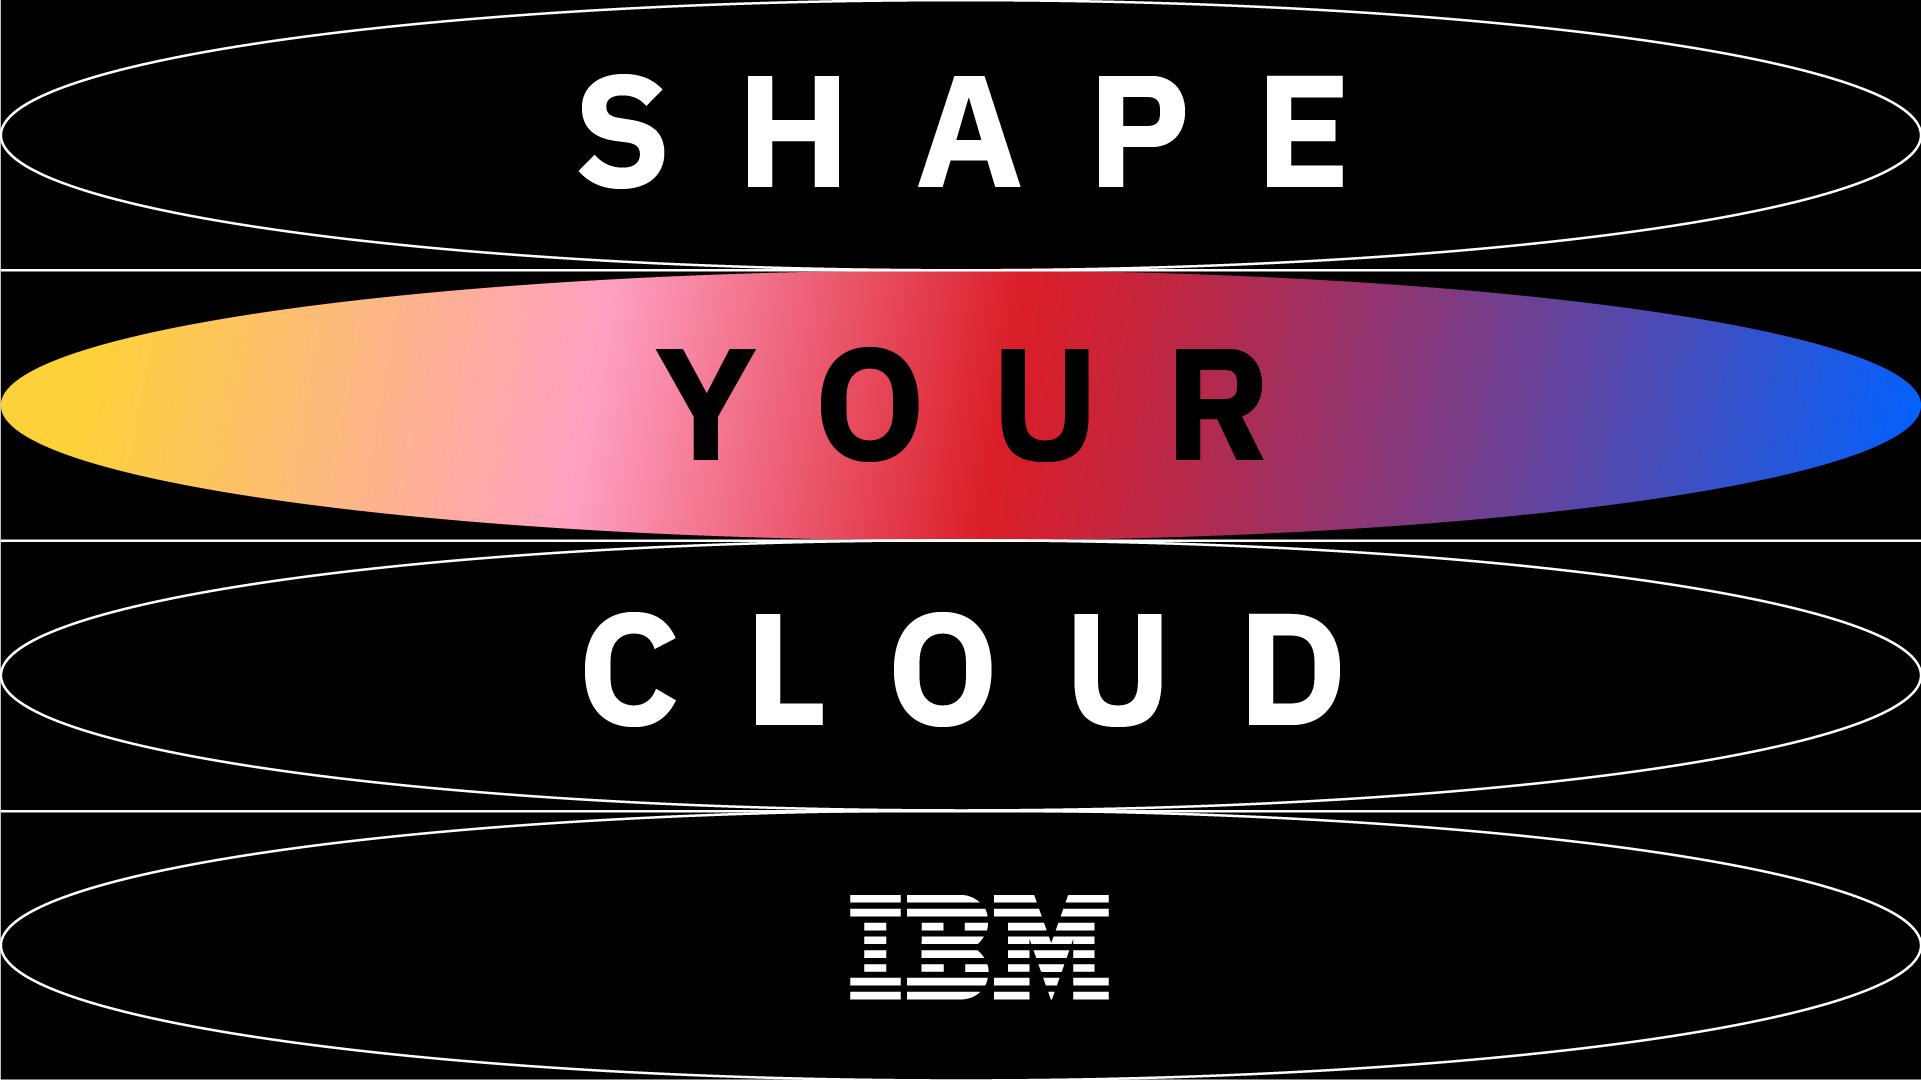 IBM_SHAPE-YOUR-CLOUD_DC_EDITS_BH_proceso_IBM-process-16.jpg